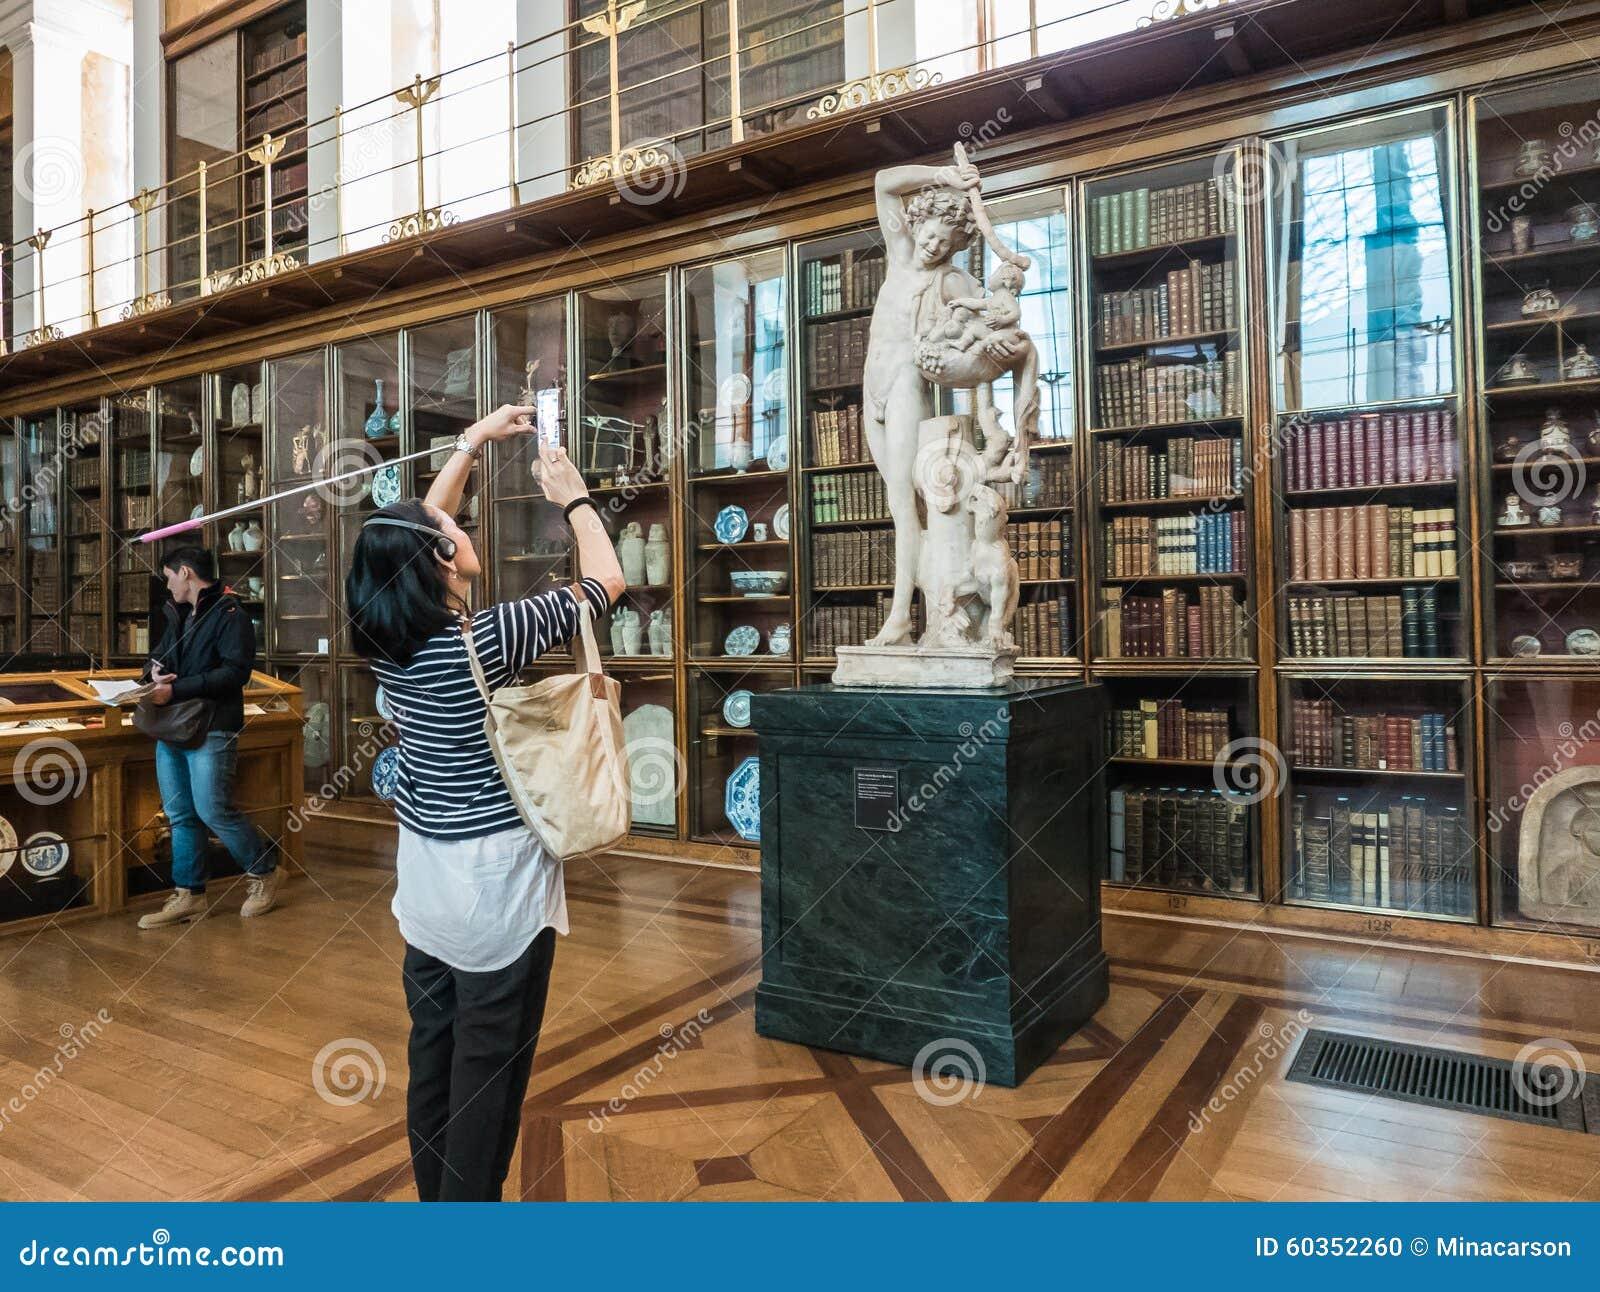 The British Museum, London: Hours, Address, The British Museum Reviews: 5/5